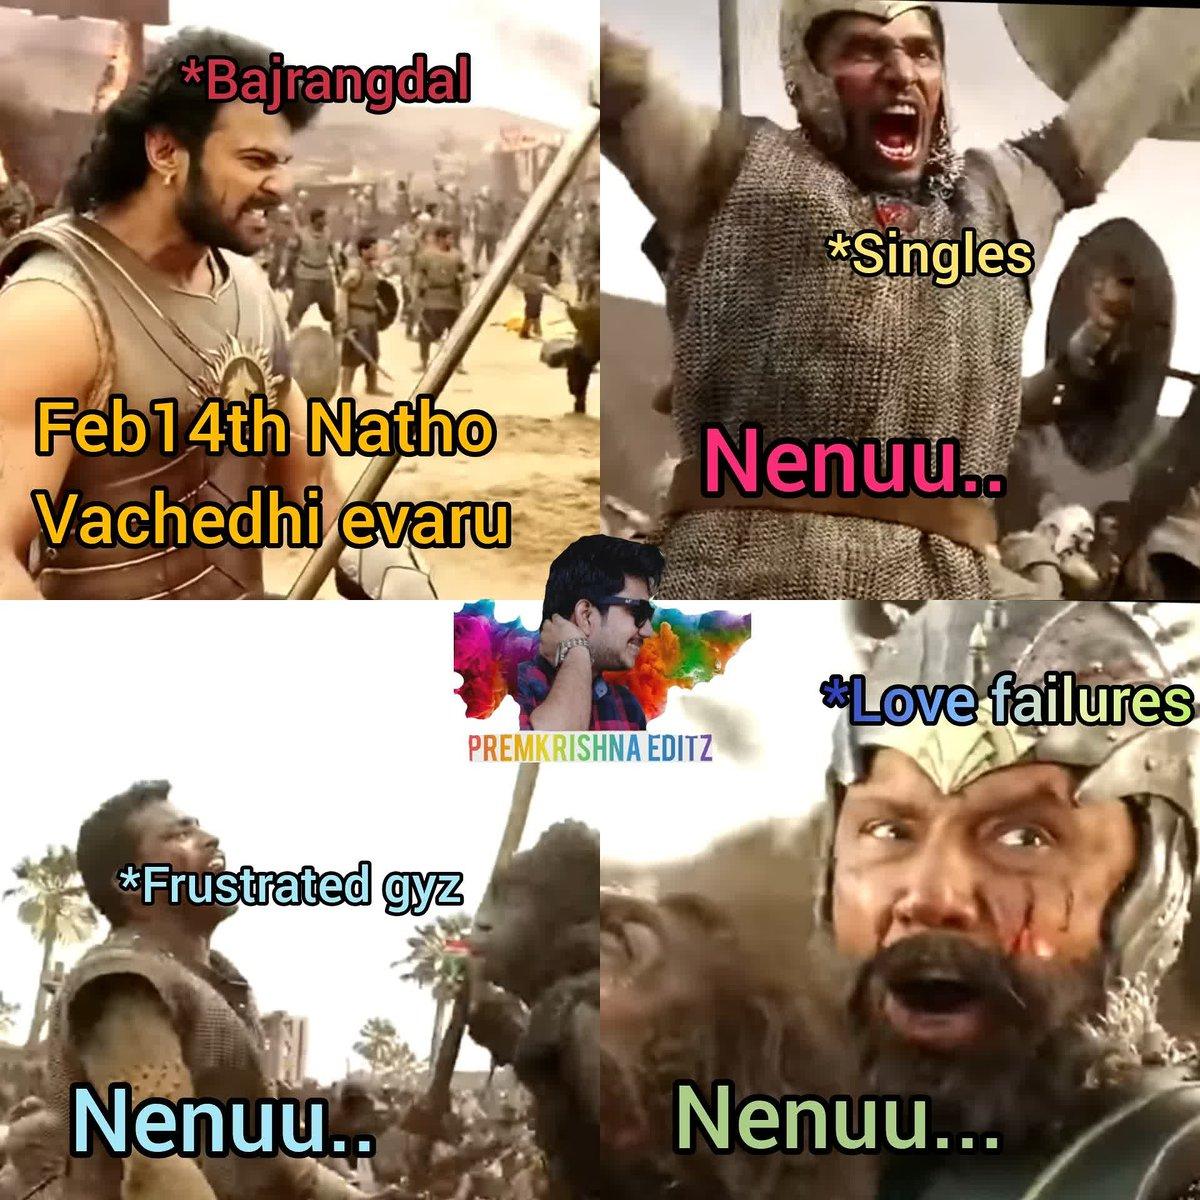 Like & follow for more fun#single #Crickettrolls #telugutrolls #tamiltrolls #tamilcomedy #telugucomedy #telugumemes #teluguedits #funnyedits #telugucomedy #trending #bestmemes #jabardasth #adhirindhi #trending #telugucomedy #telugumemespic.twitter.com/uDhhbtbMz2